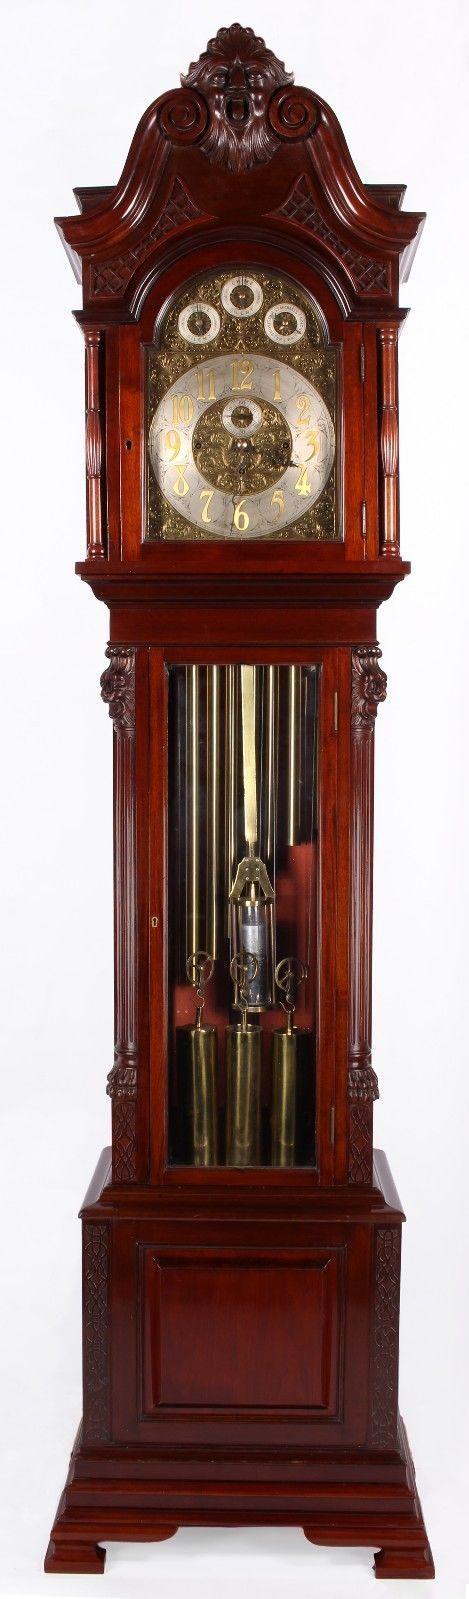 large mahogany tube chiming clock with mercurial pendulum grandfather